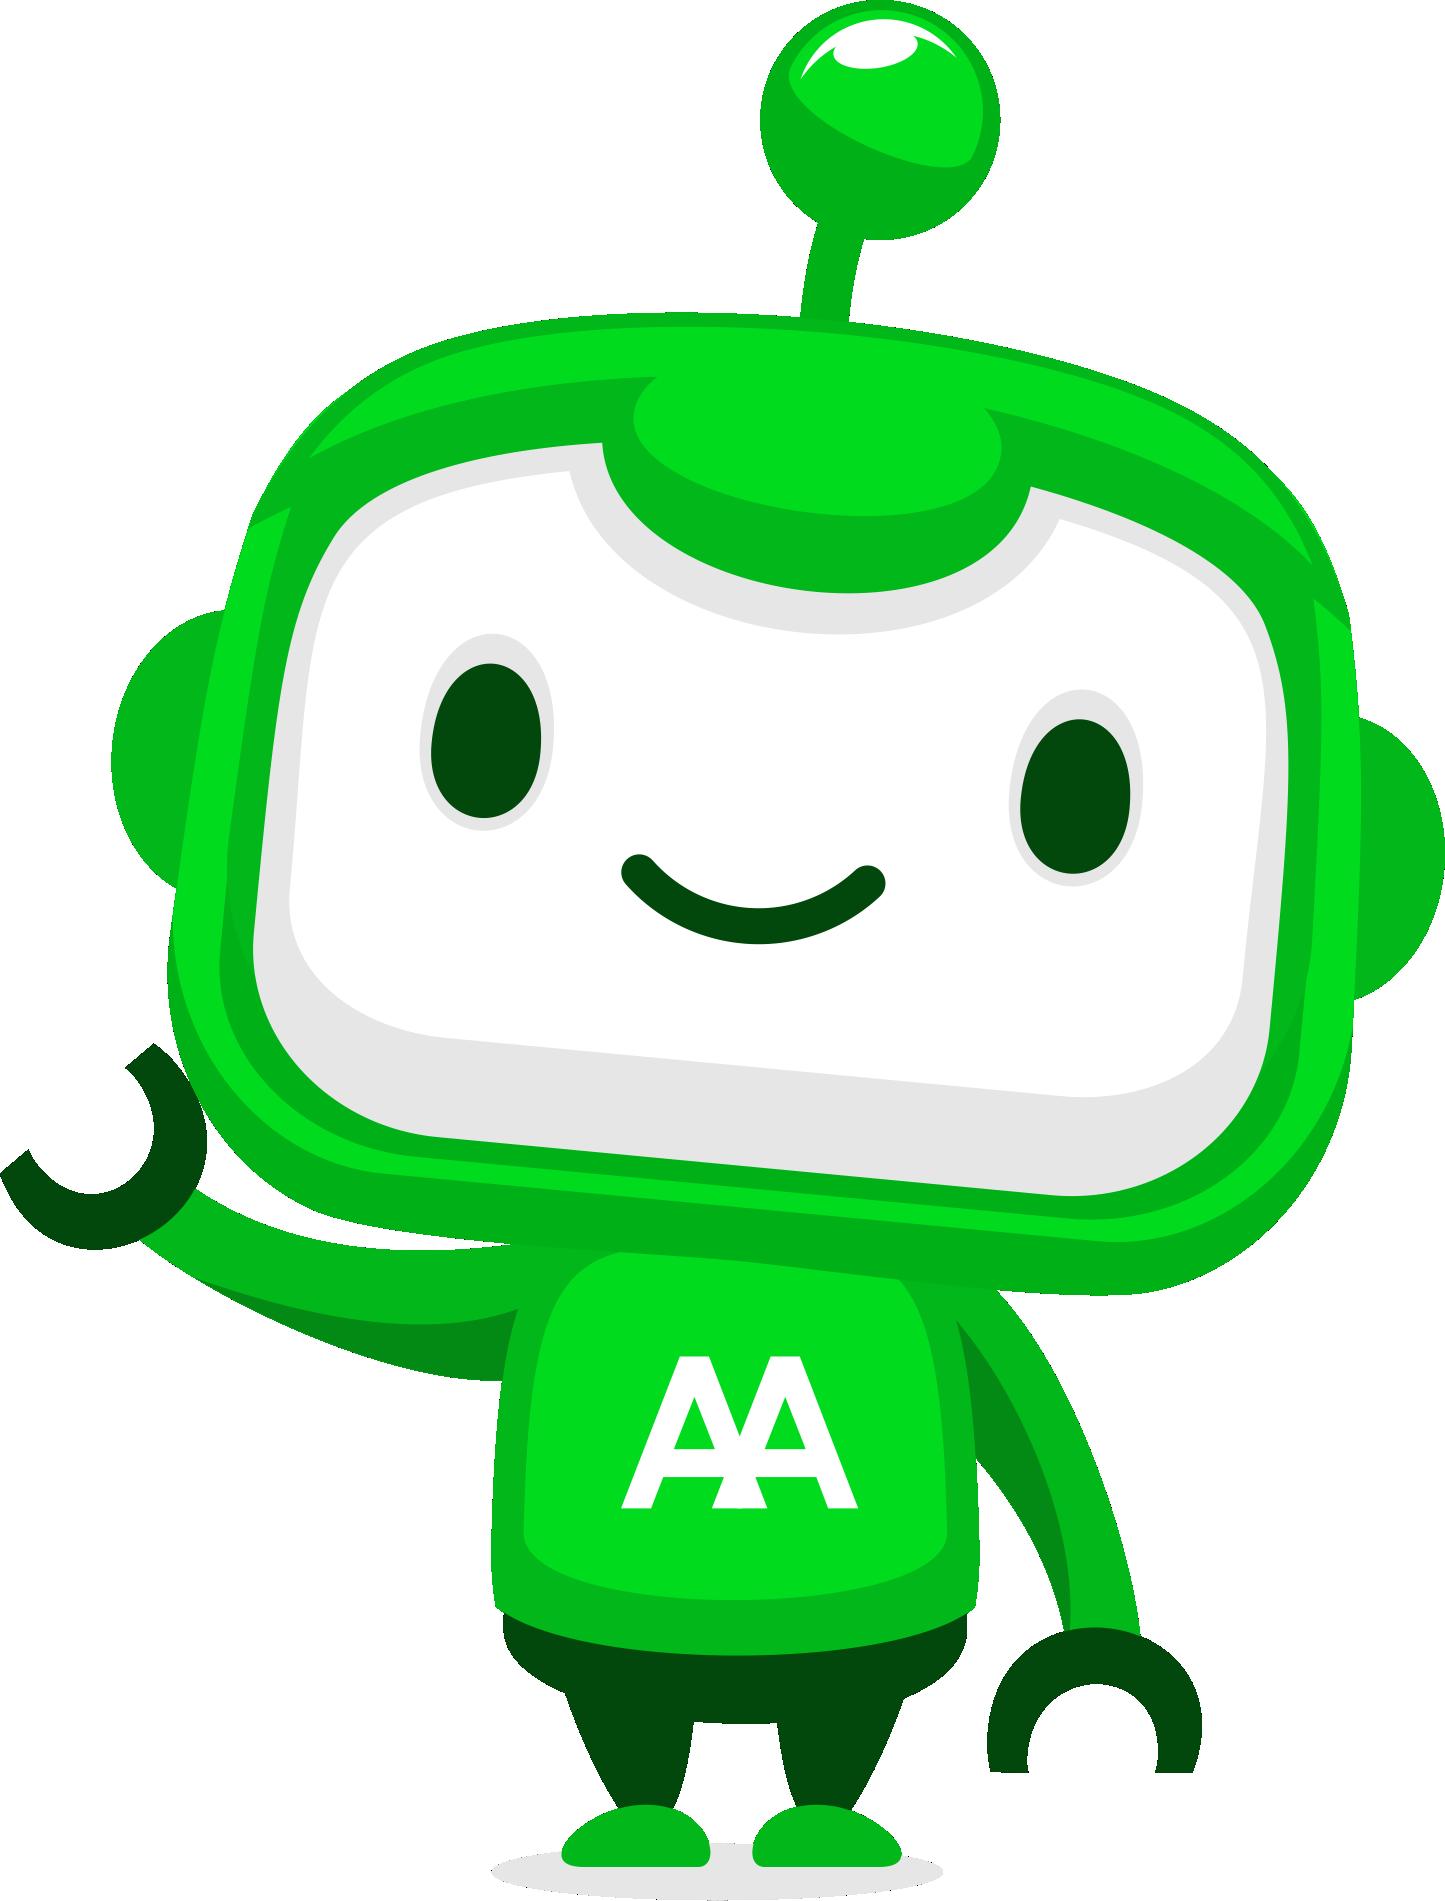 Friendly Robot character design for mobile app